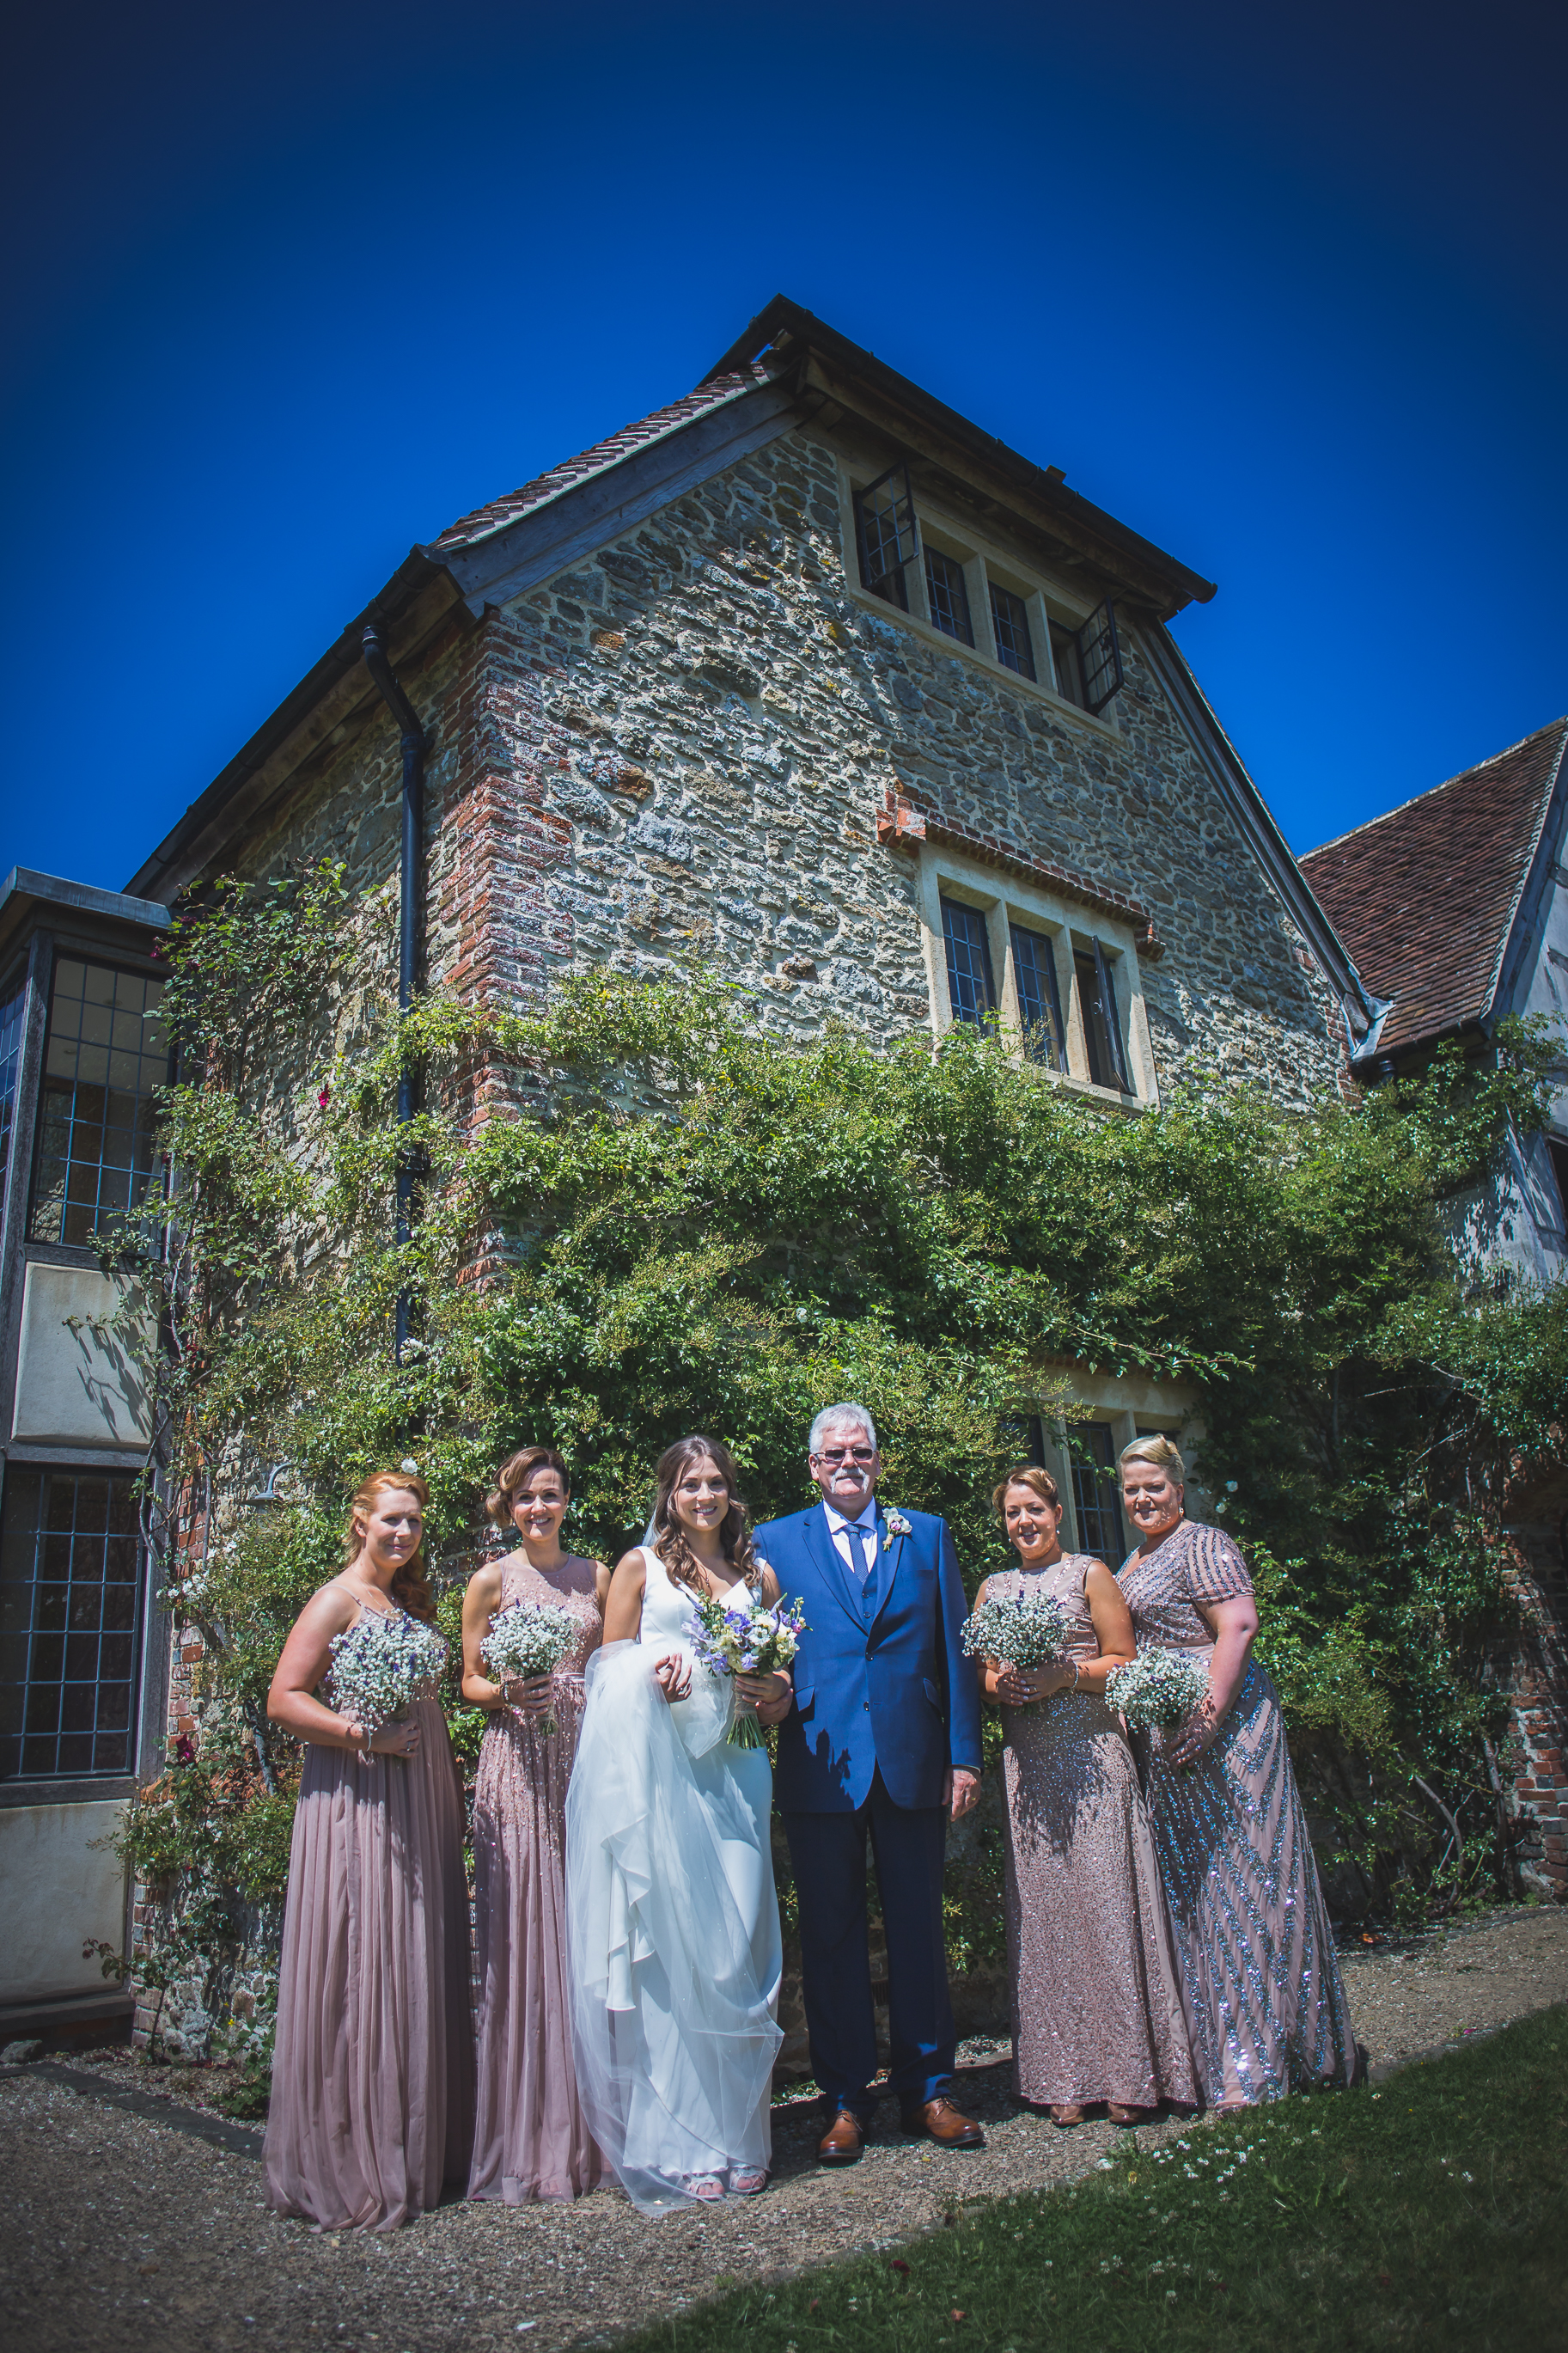 Grittenham Barn female wedding photographers west sussex petworth social-43.jpg